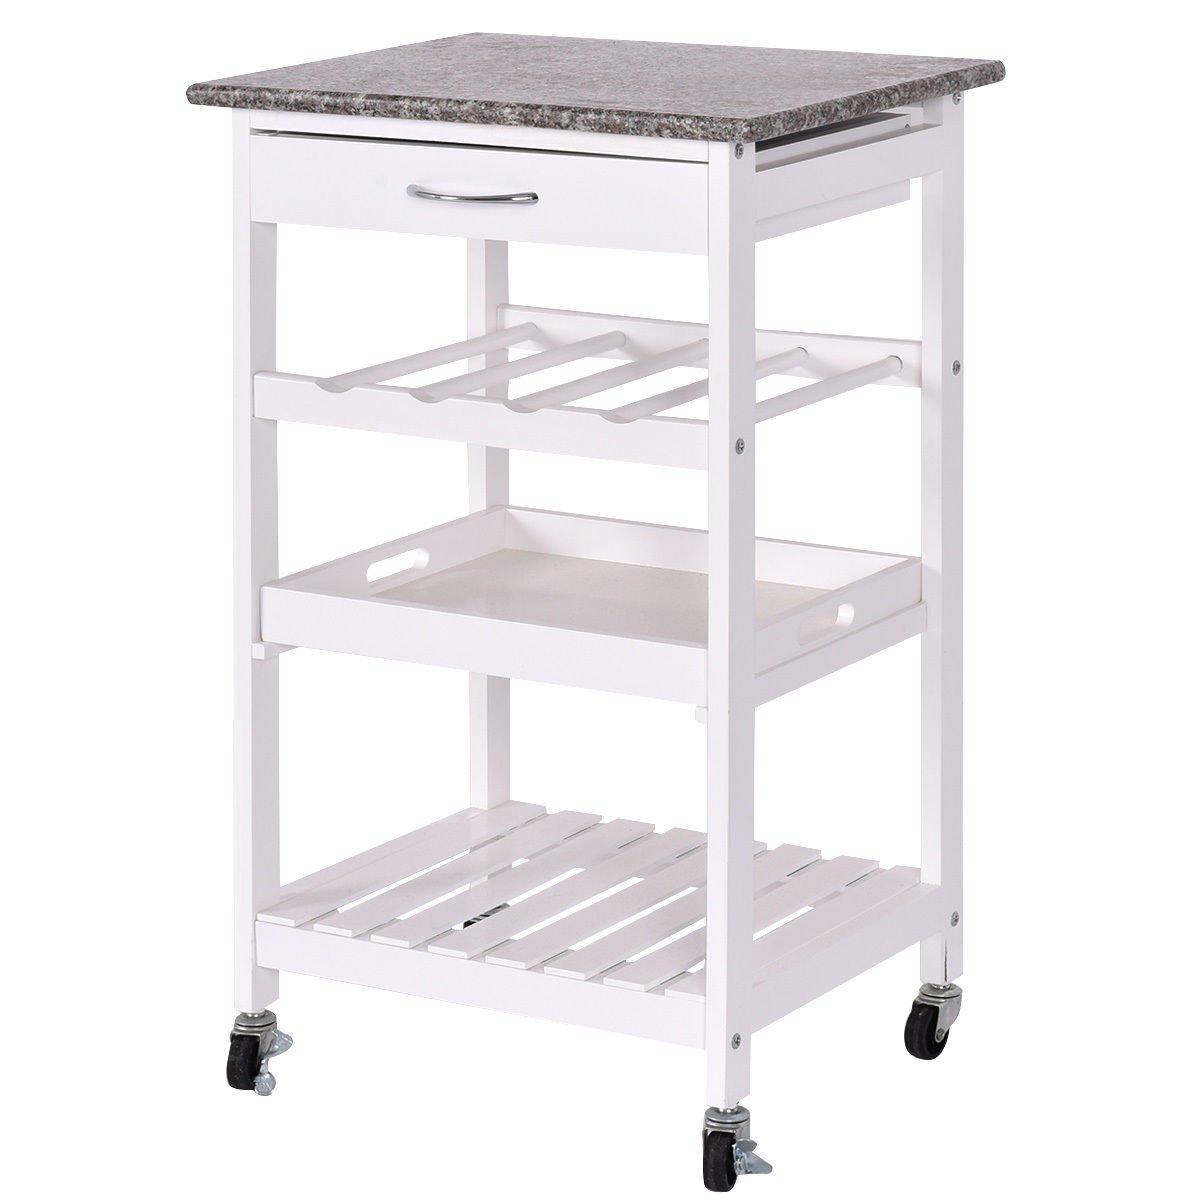 4-Tier Rolling Wood Kitchen Trolley Island Cart Storage Shelf Drawer Rack New for more storage.